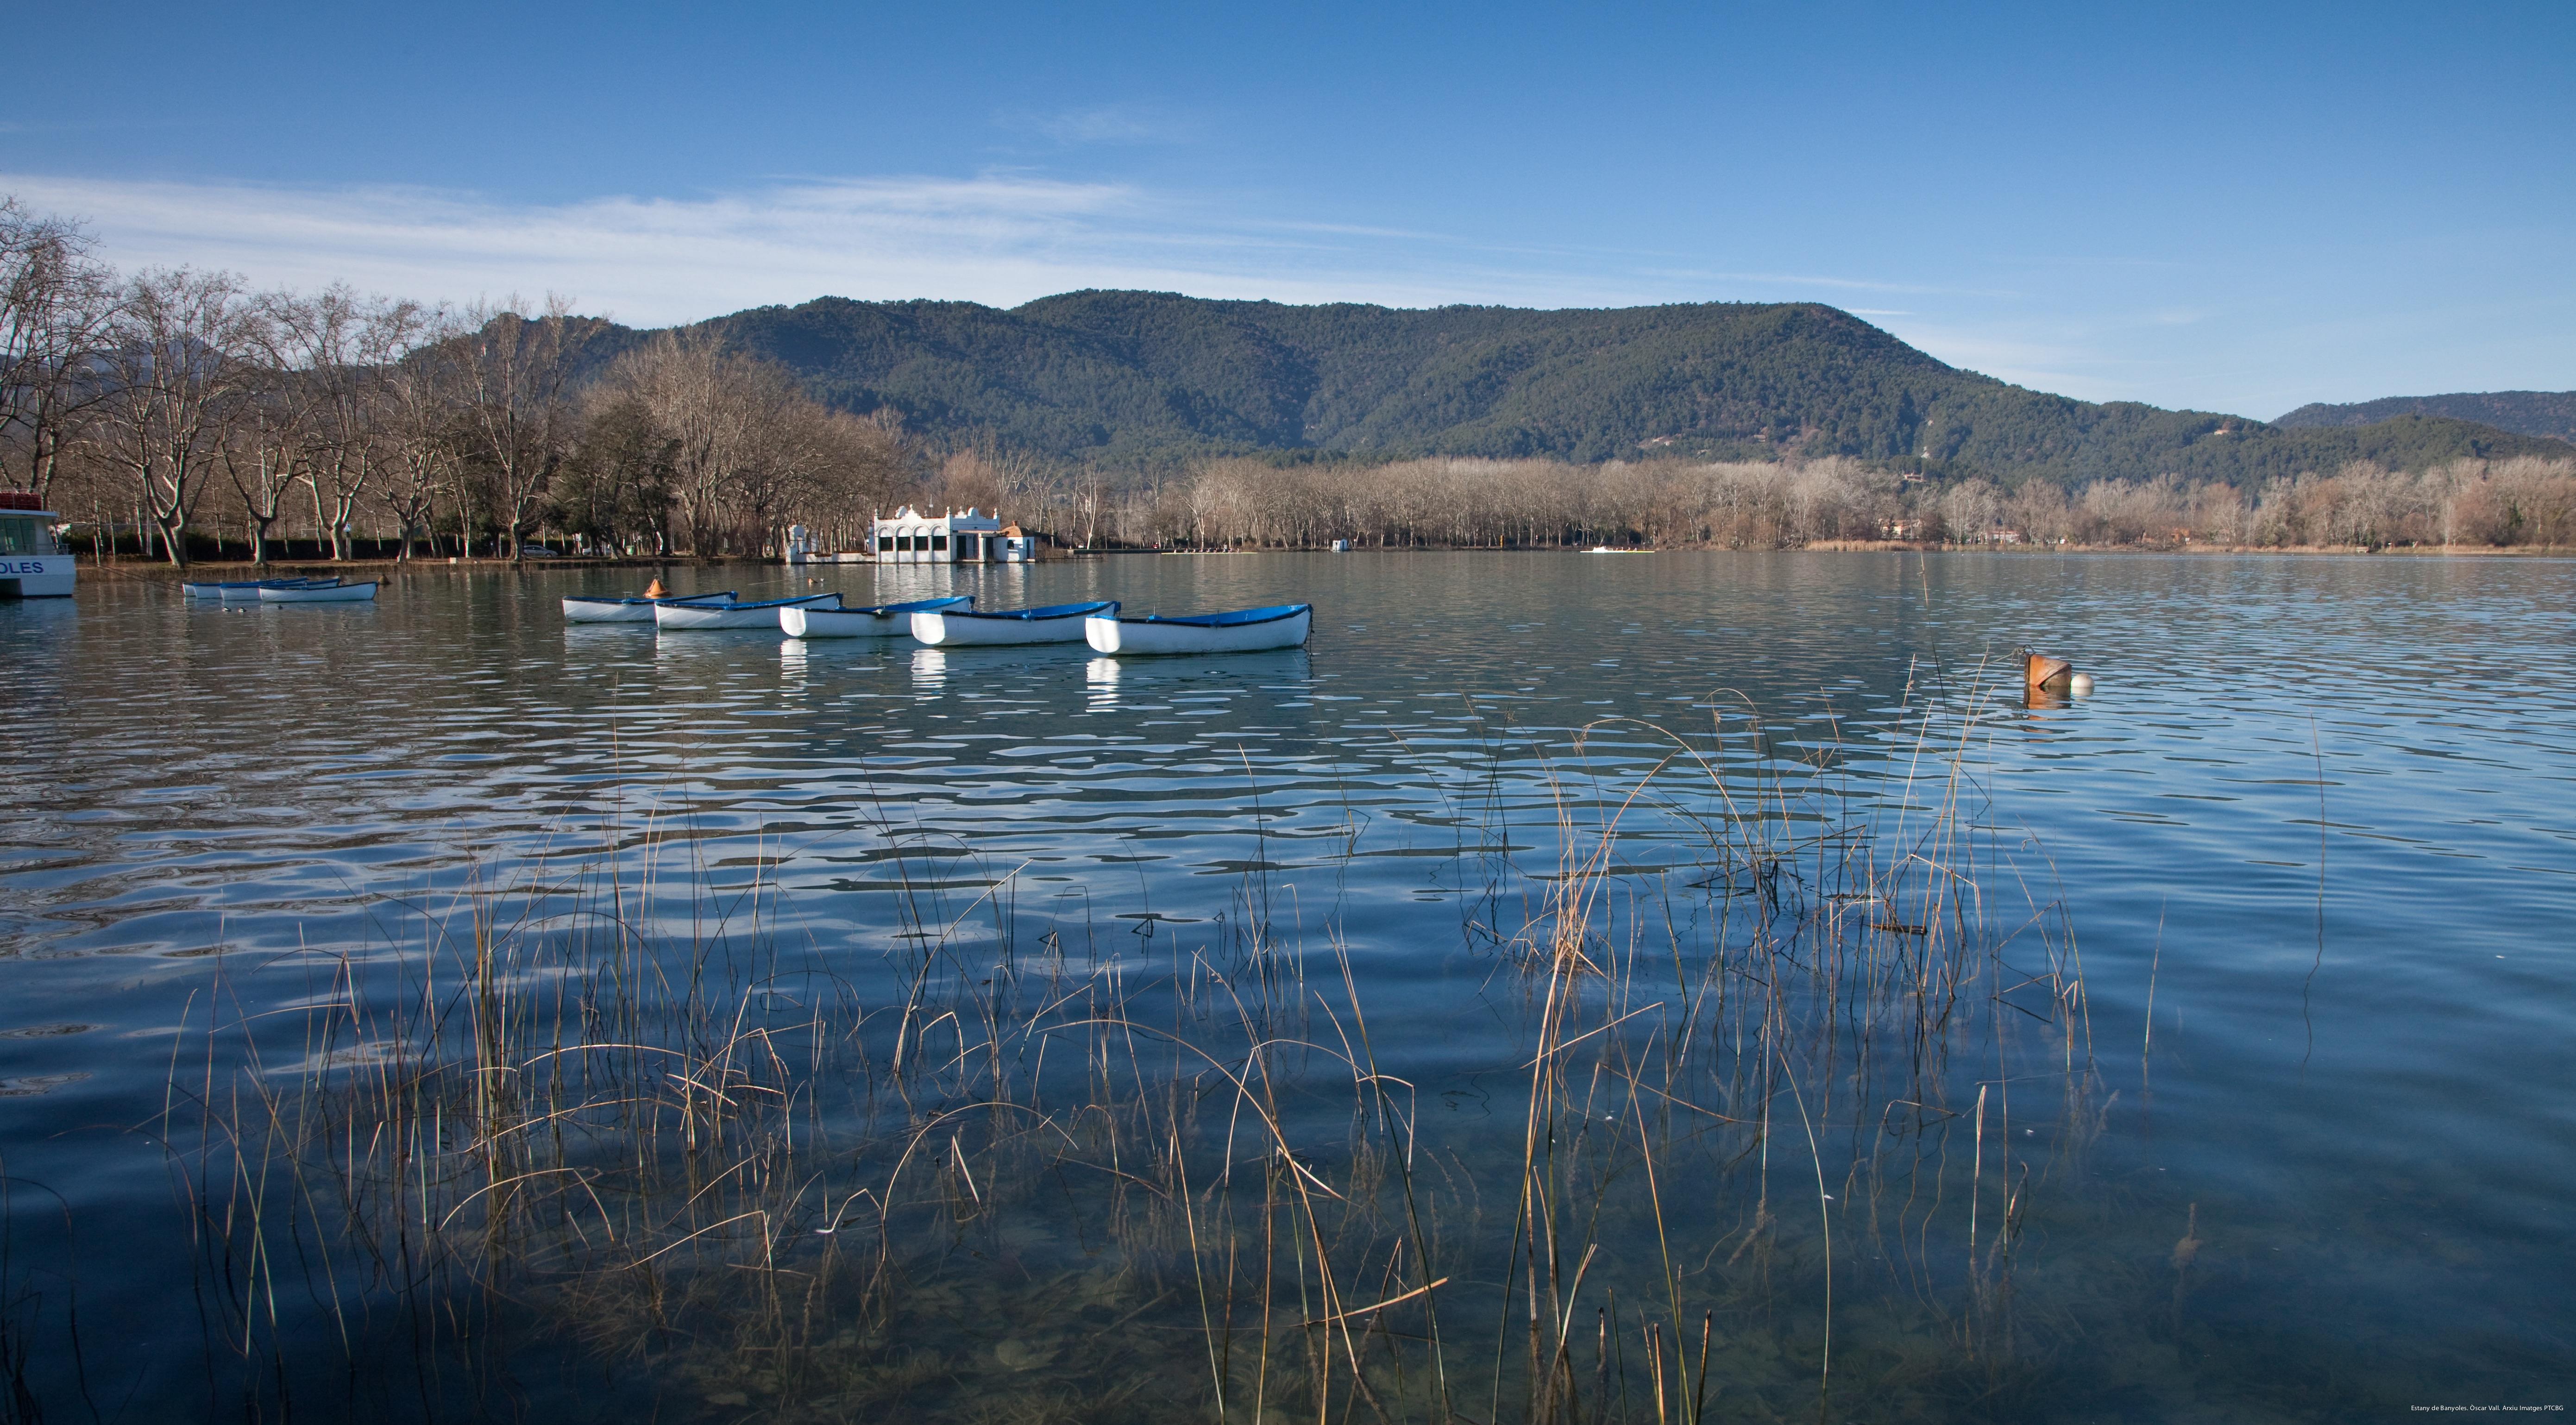 Lac de Banyoles © Oscar Vall - PTCBG